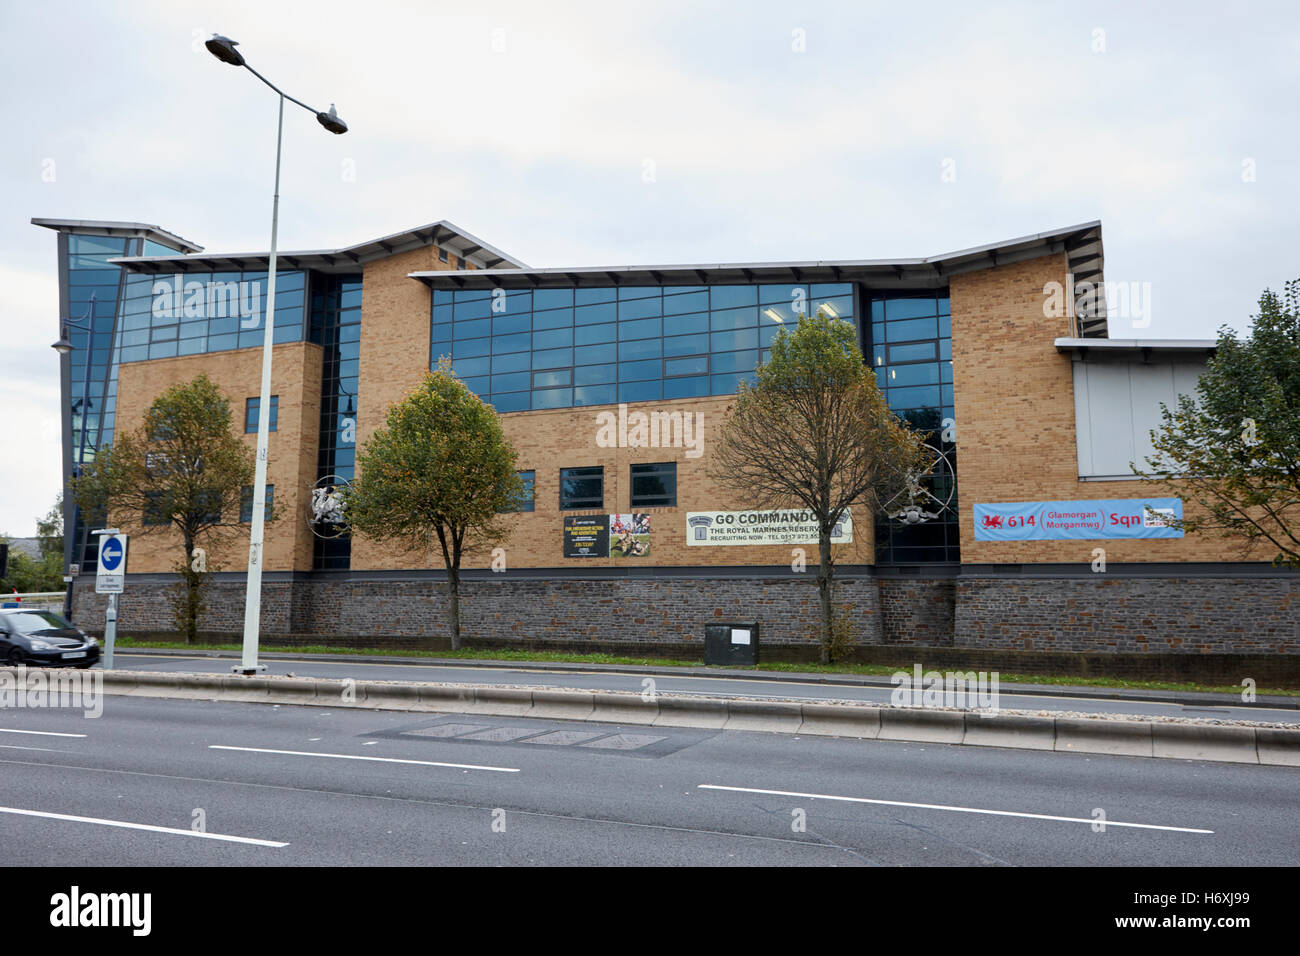 Ty Llewellyn army reserve barracks Cardiff Wales United Kingdom - Stock Image